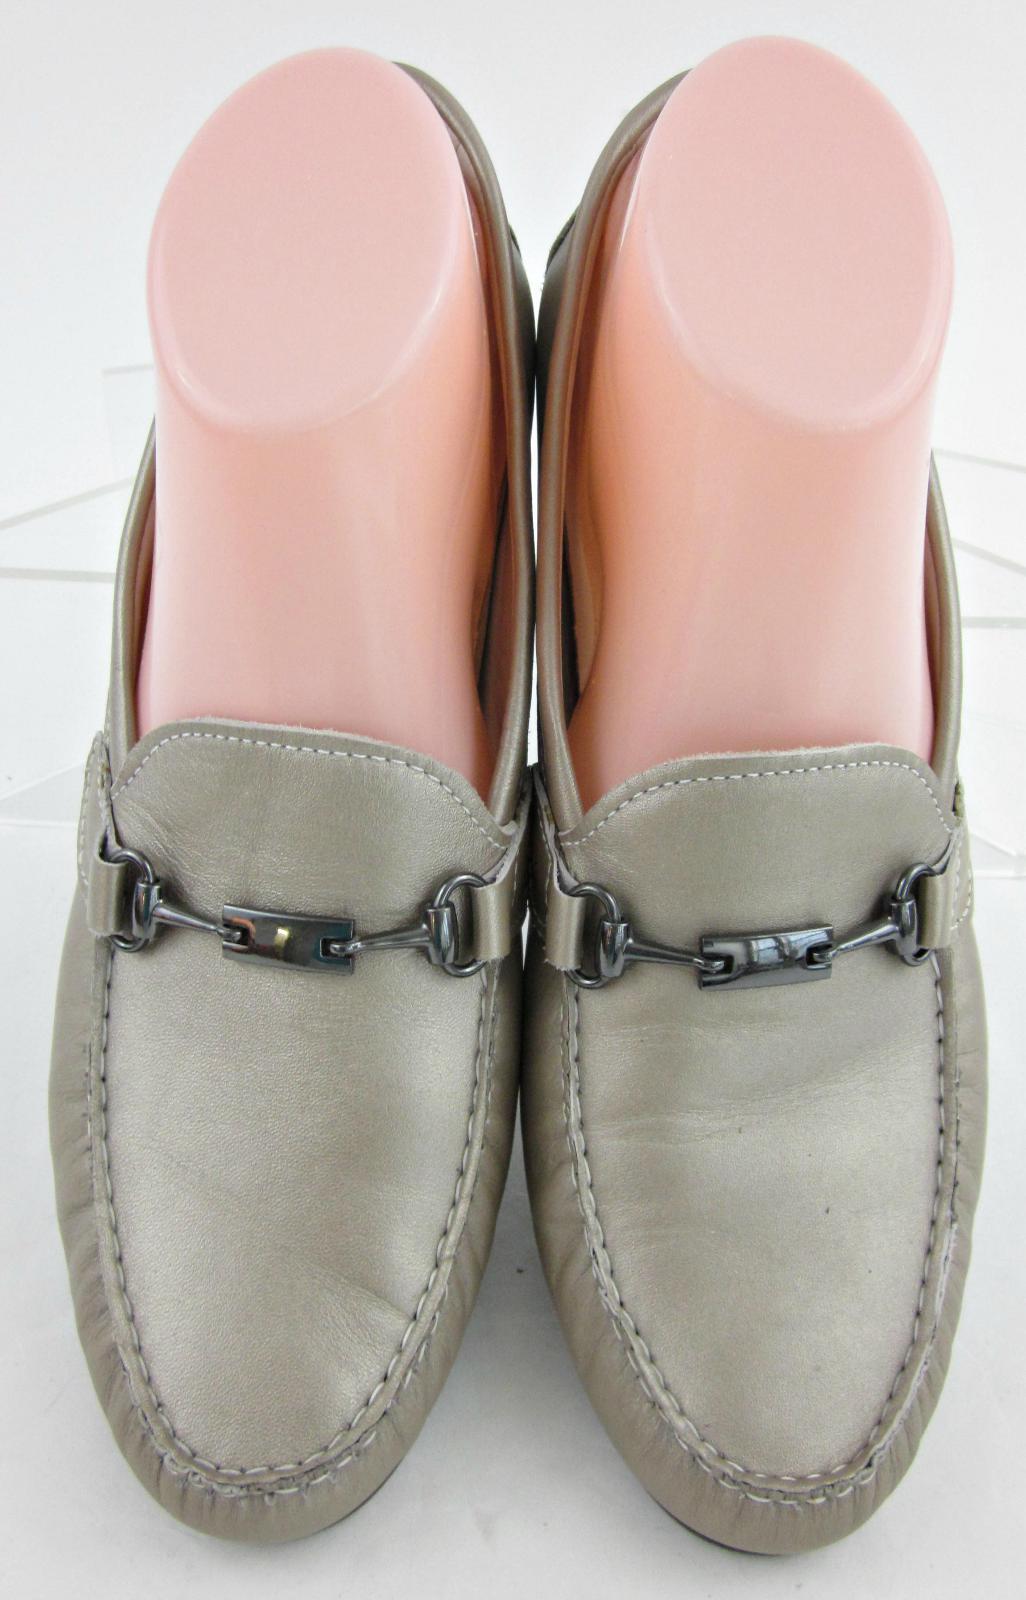 Munro Munro Munro American 'KIMI' Moc Toe Bit Loafers Taupe Metallic Leather US 10.5 7dc1ed